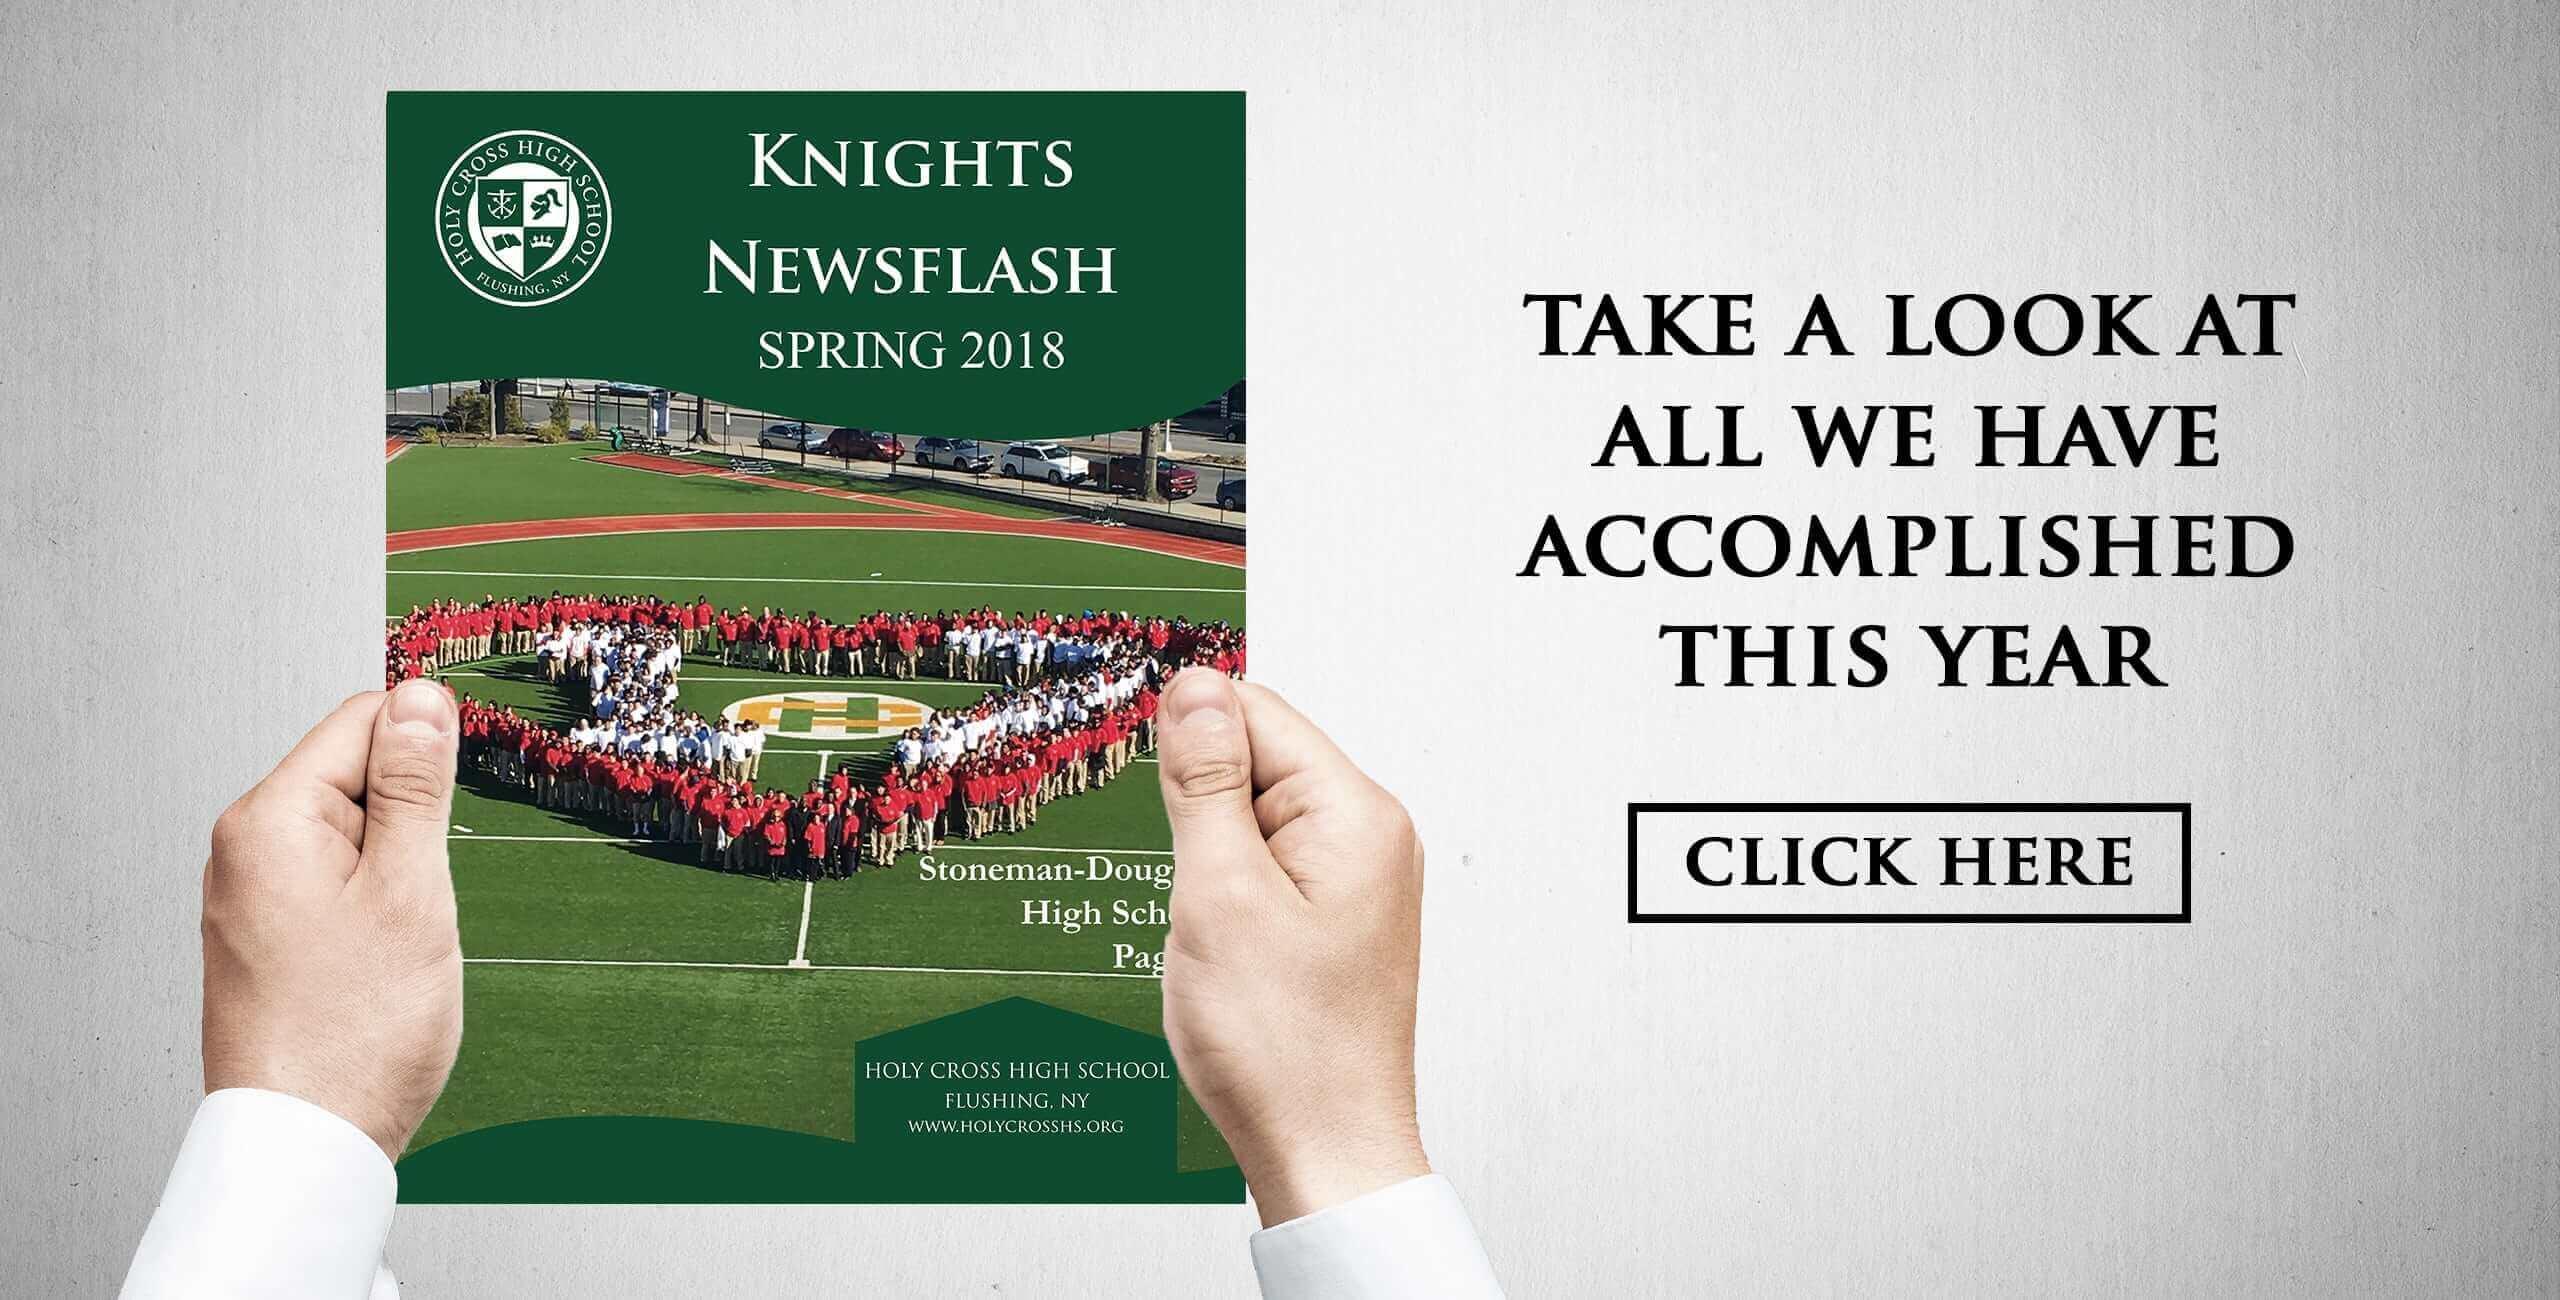 knightsnewsflash2